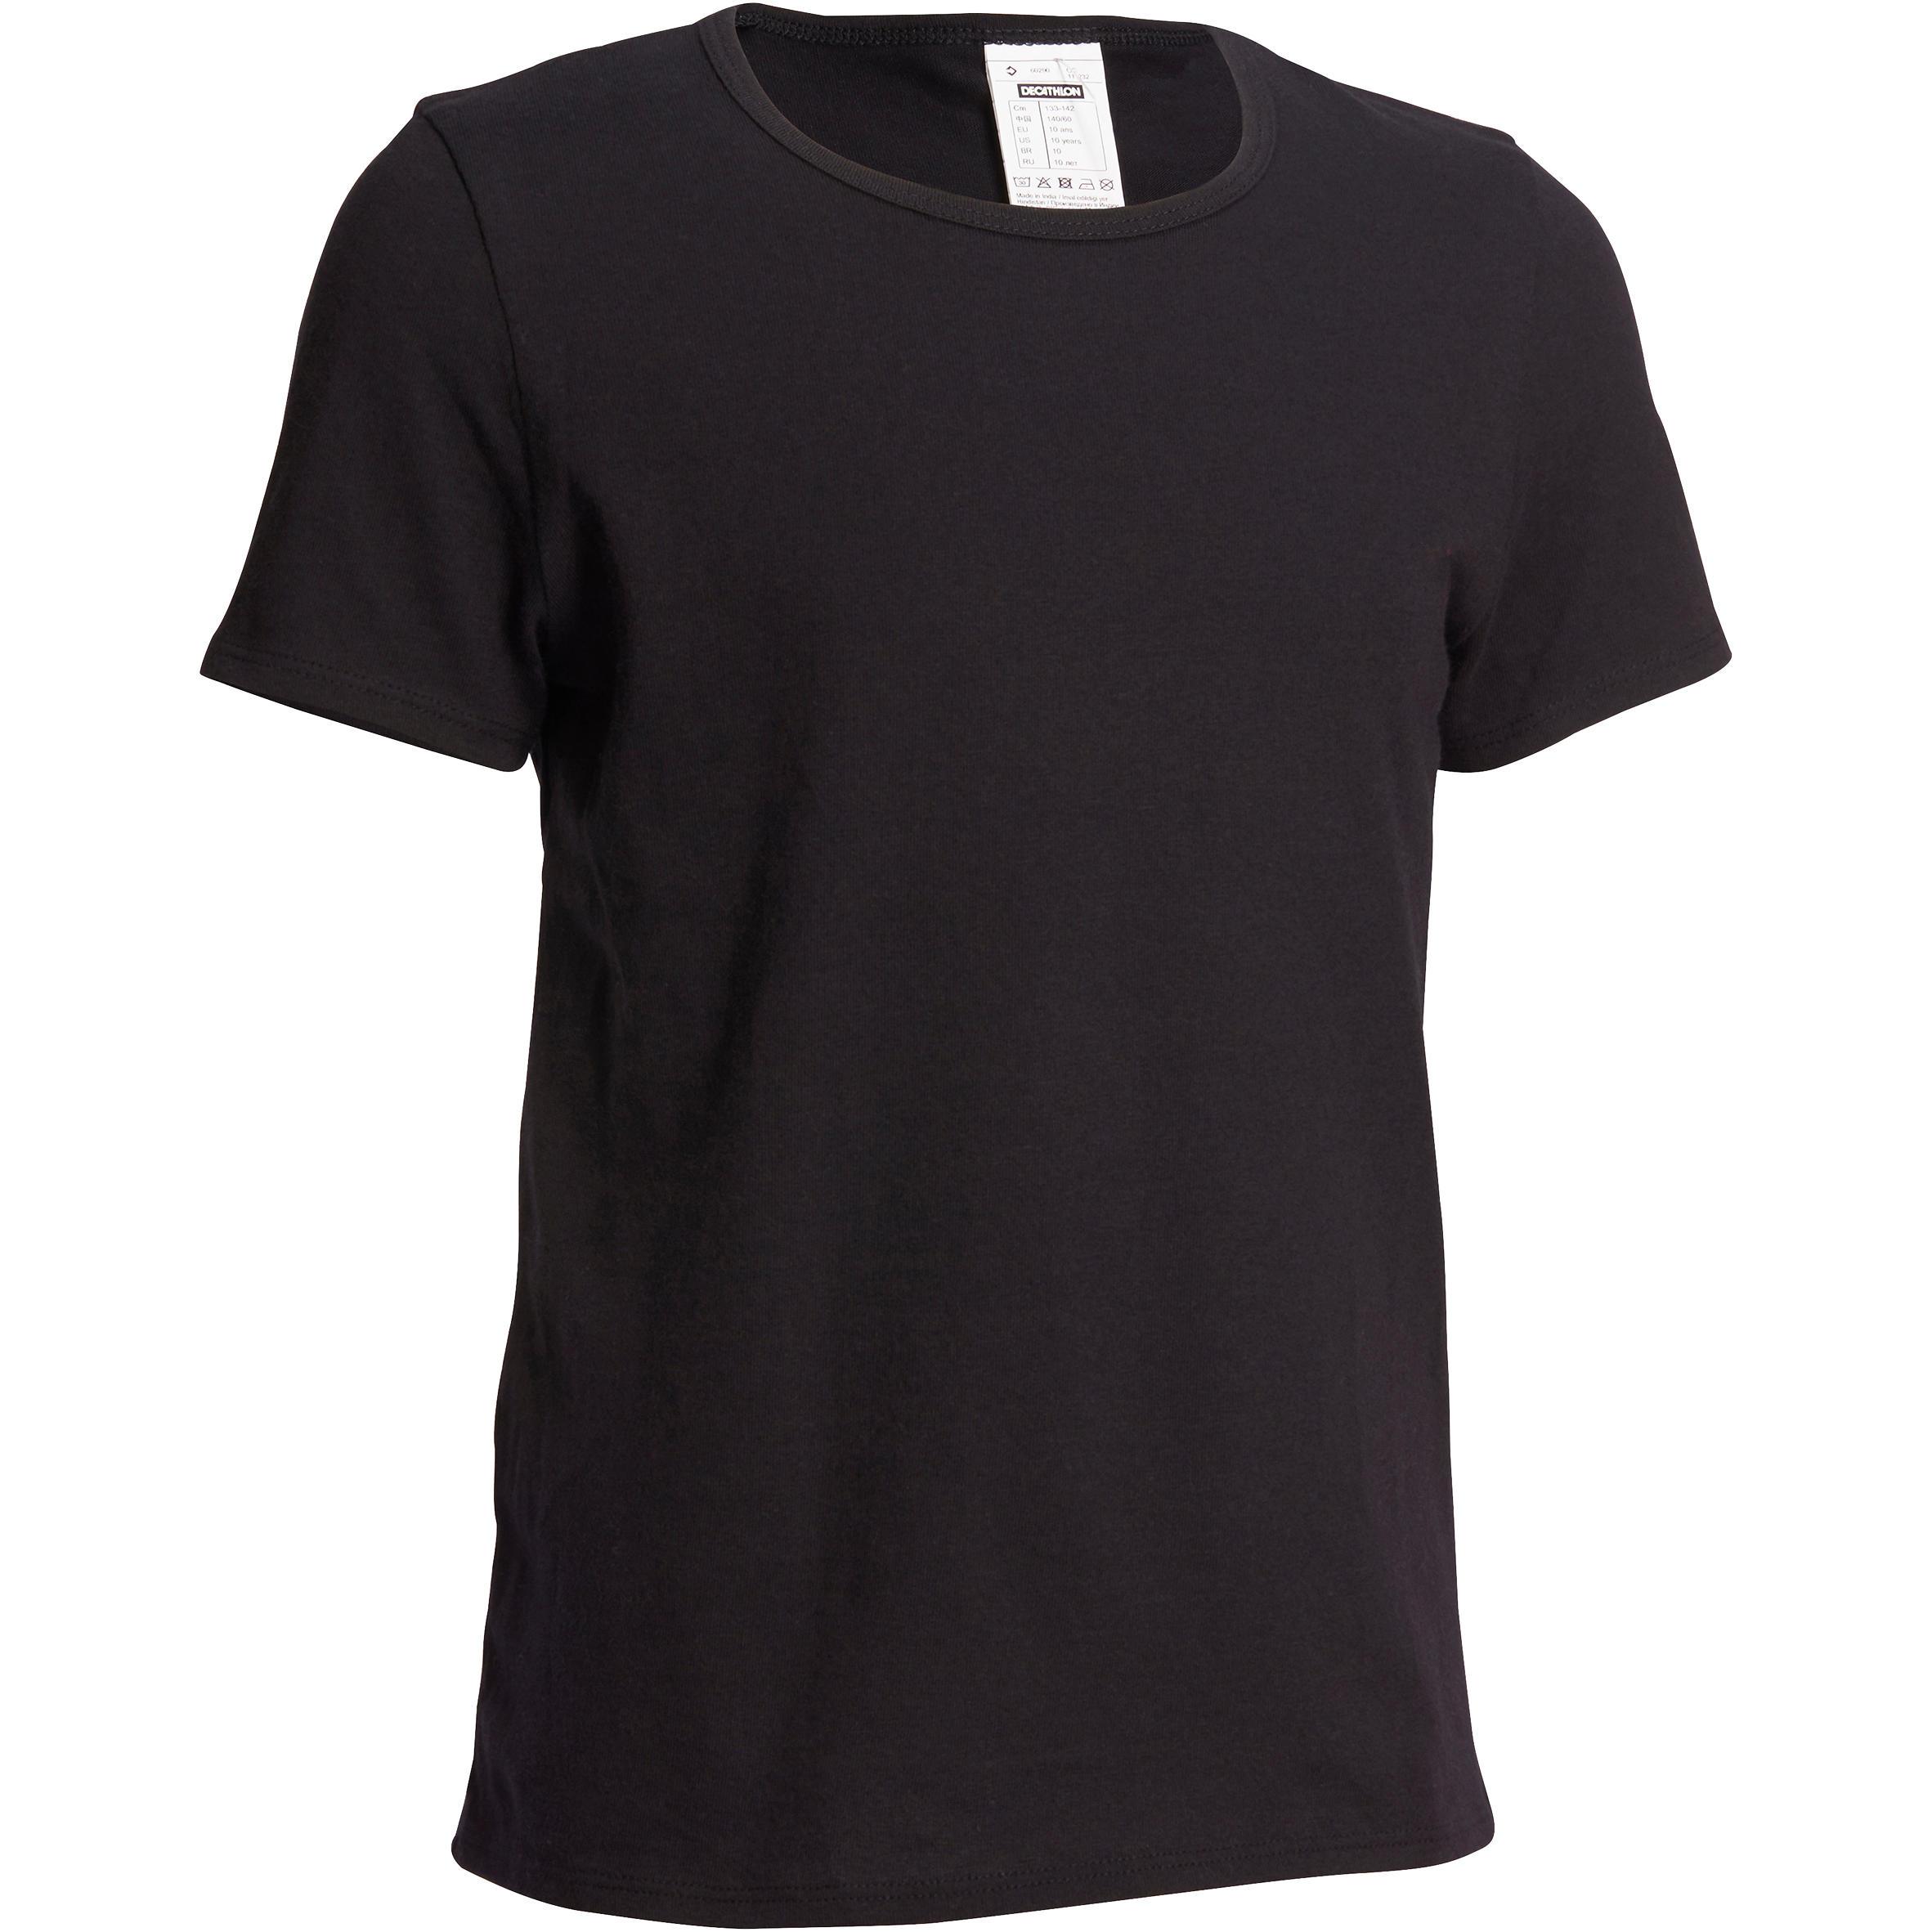 Camiseta de manga corta gimnasia niño negro